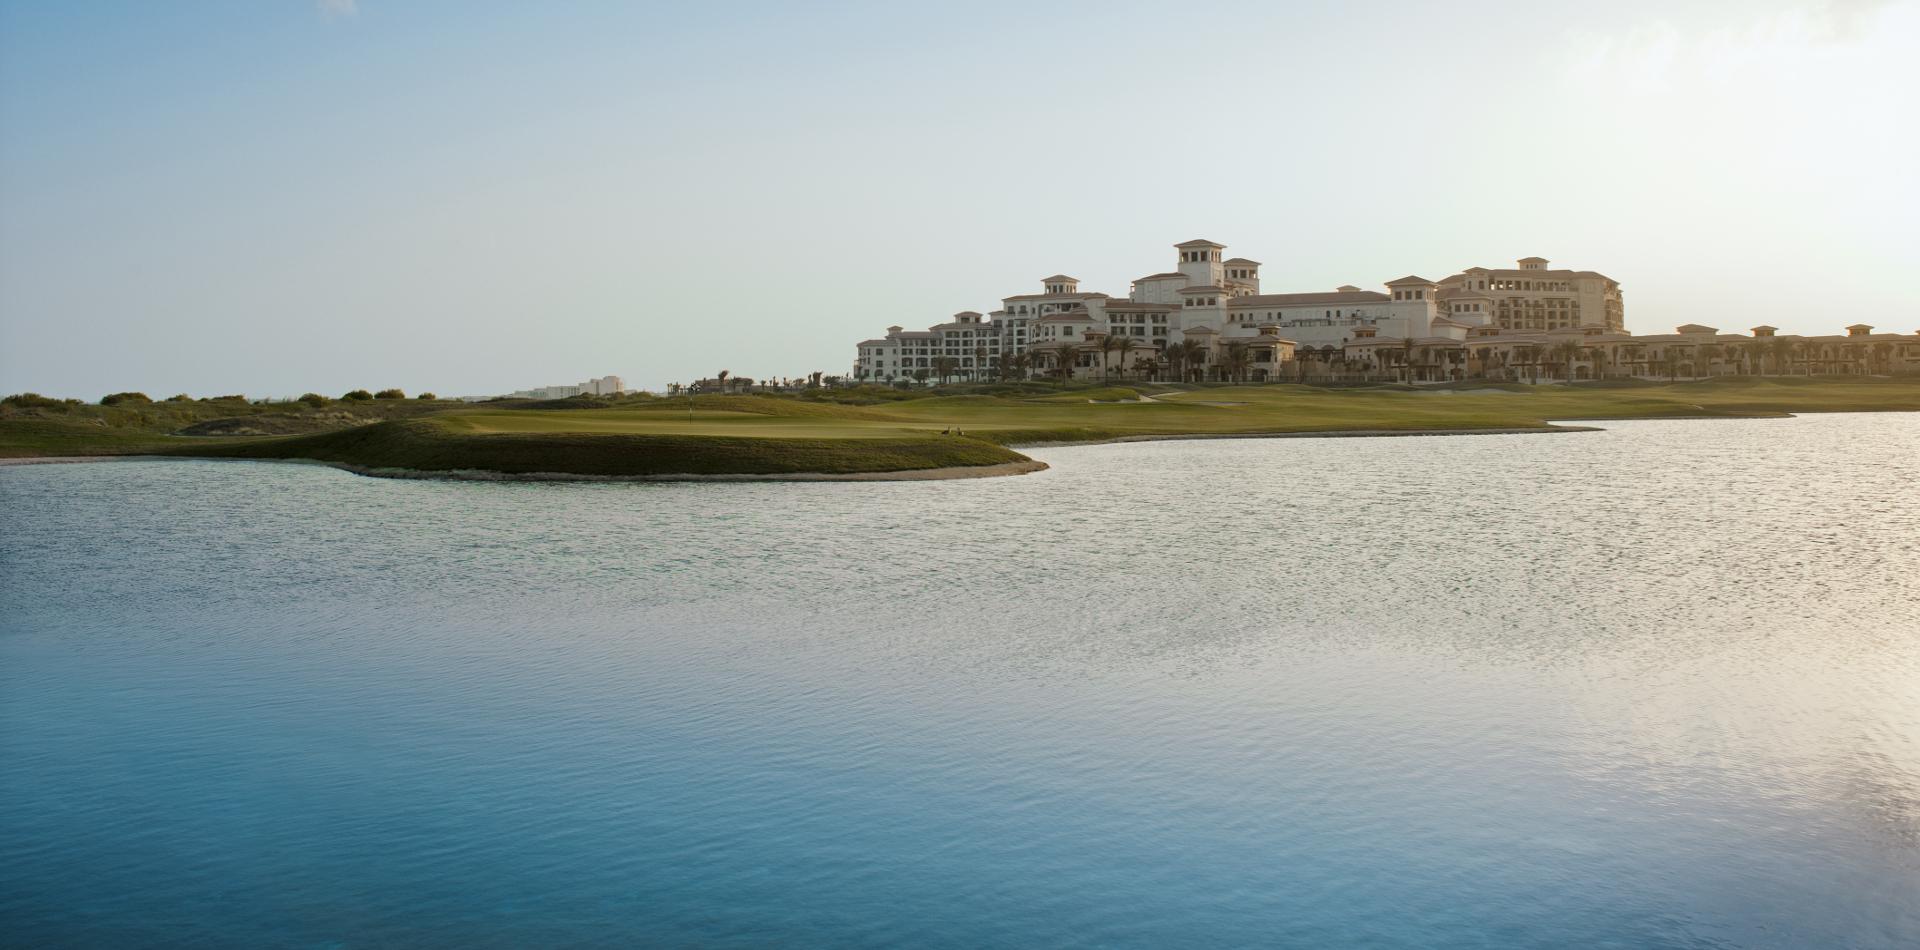 Luxushotel St. Regis Saadiyat Island Resort Abu Dhabi, Luxushotel Abu Dhabi, Luxusurlaub Abu Dhabi